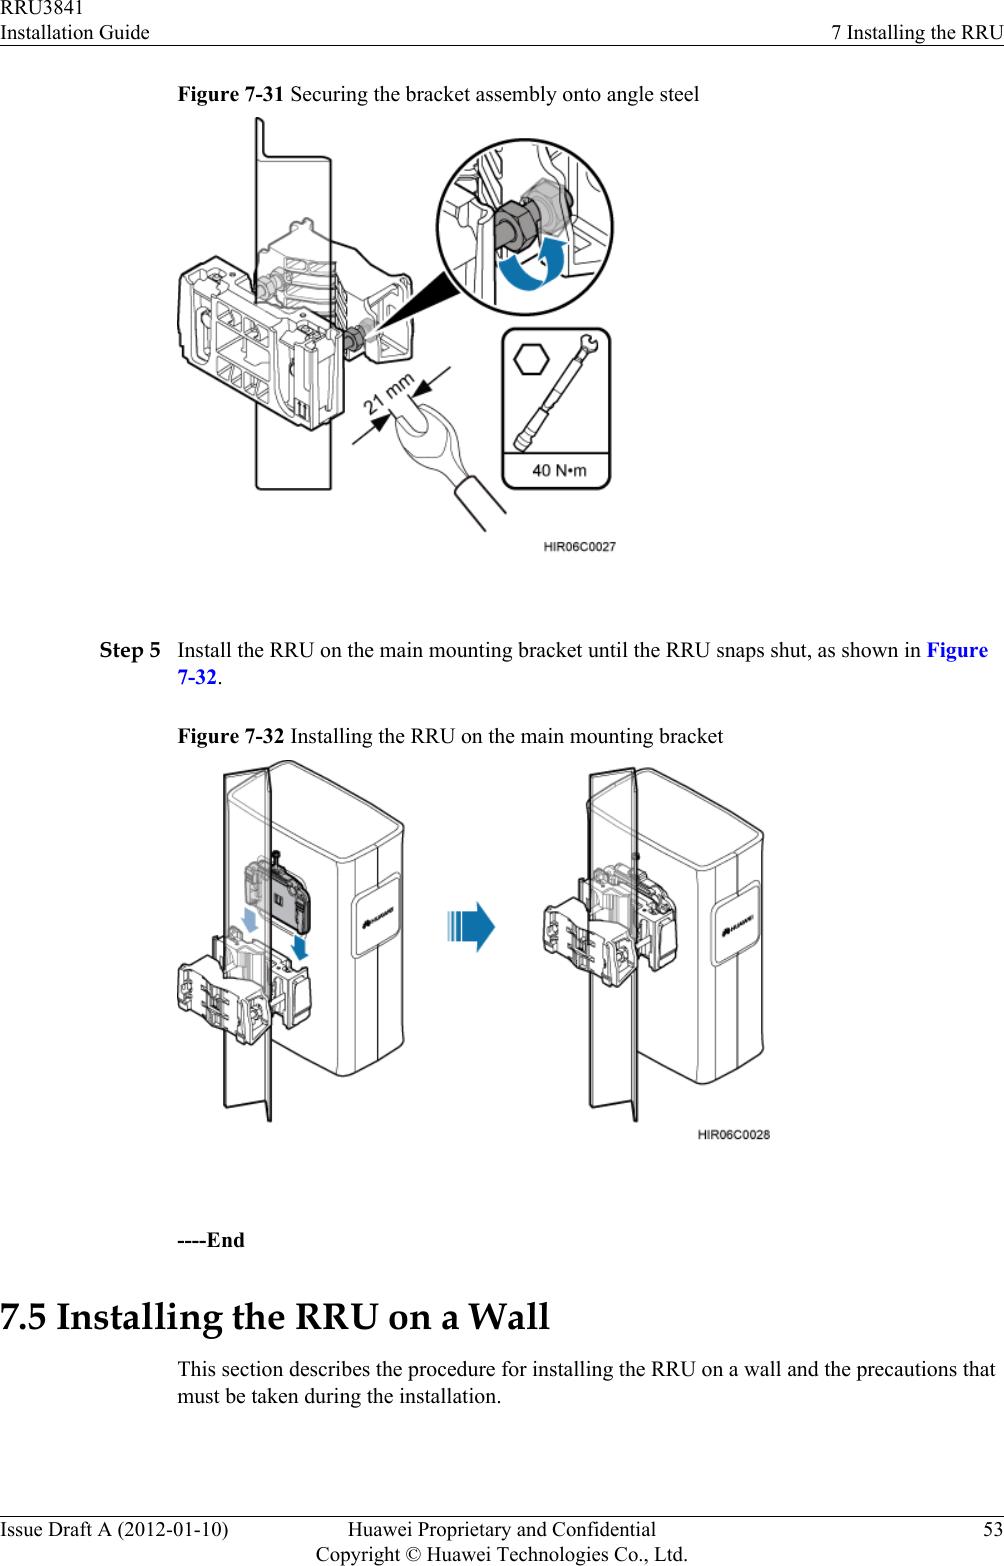 Huawei Technologies RRU3841 Remote Radio Unit User Manual